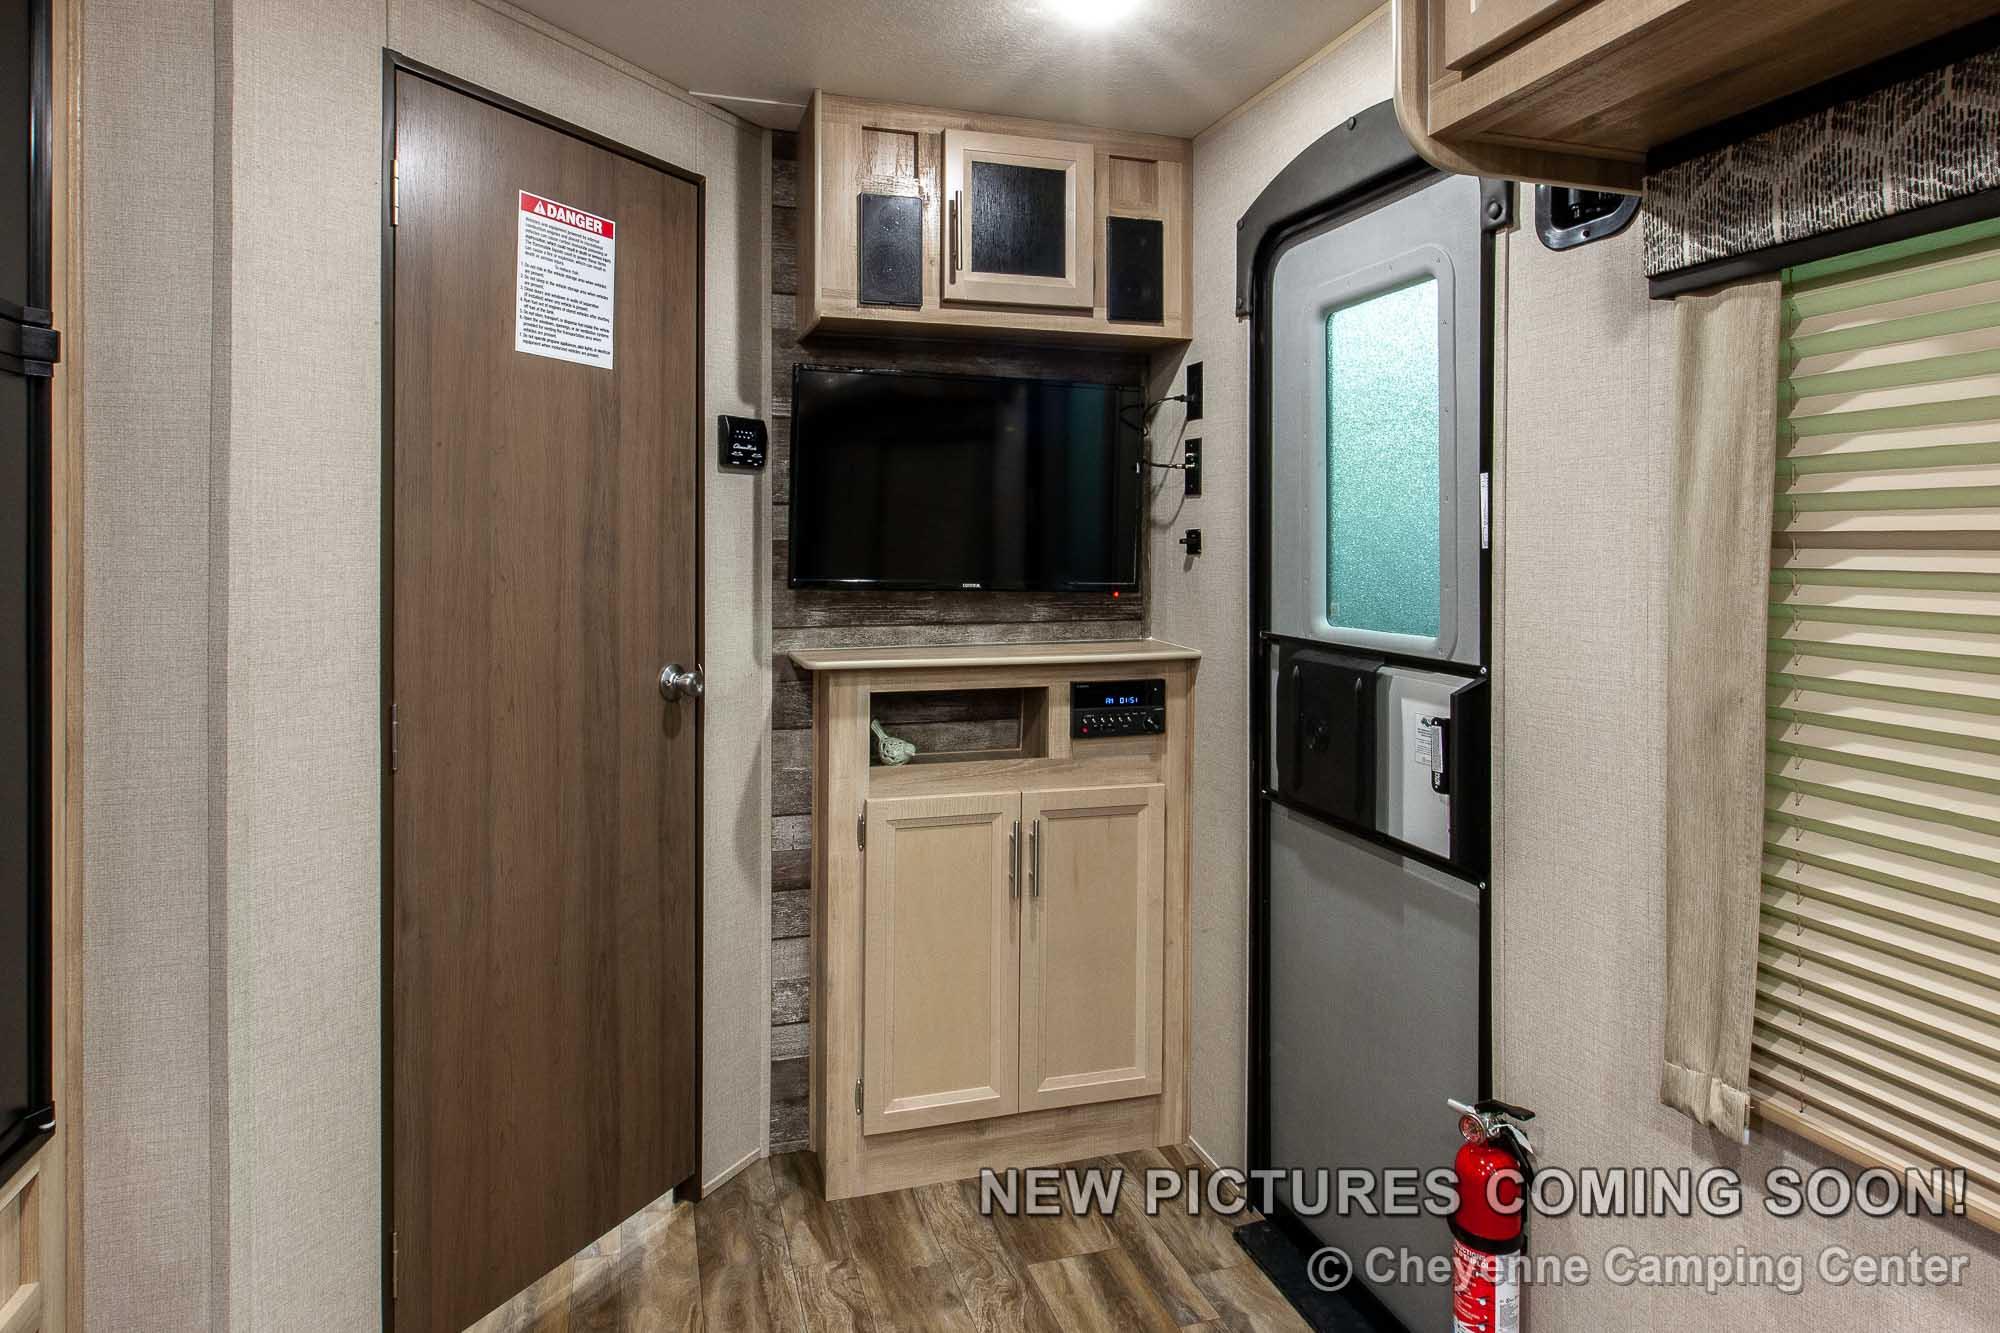 2021 Coachmen Catalina Trail Blazer 26TH Toy Hauler Travel Trailer Interior Image